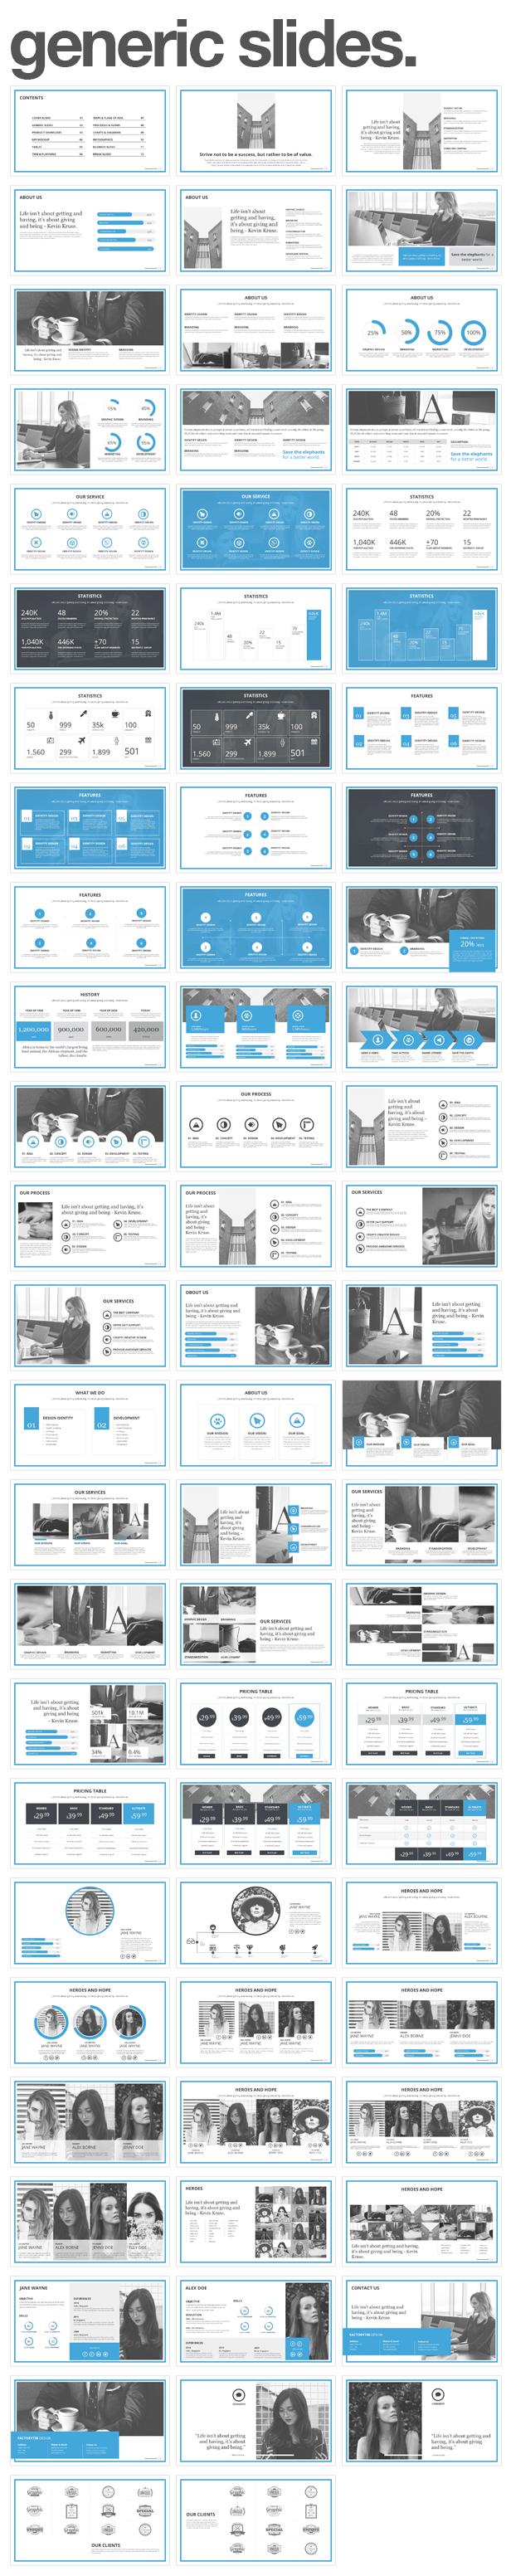 generic slides